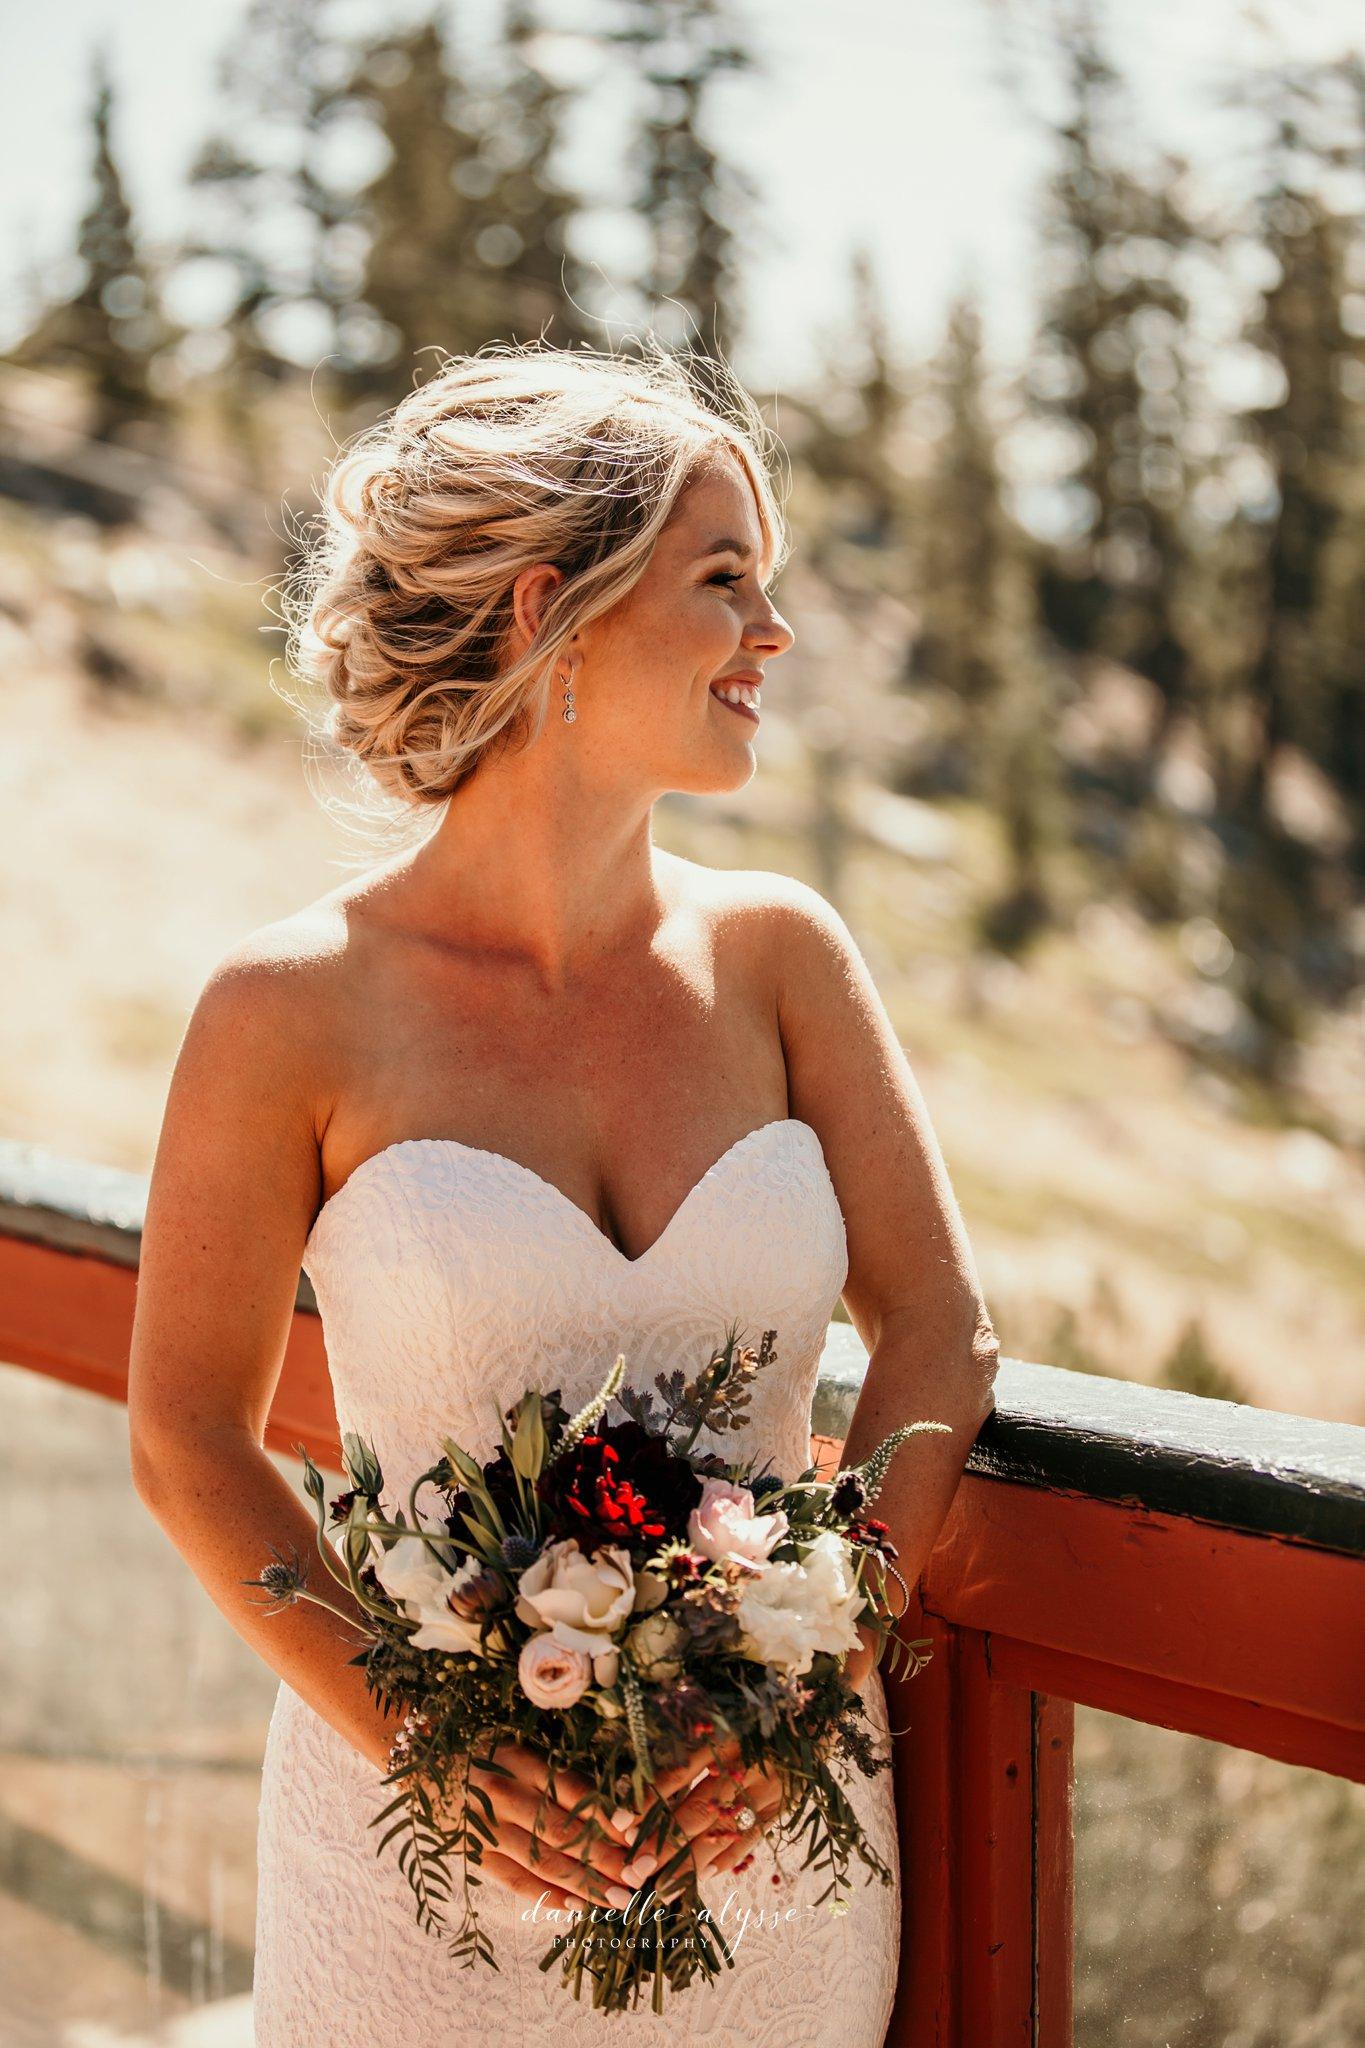 180831_wedding_stephanie_heavenly_south_lake_tahoe_danielle_alysse_photography_destination_blog_349_WEB.jpg